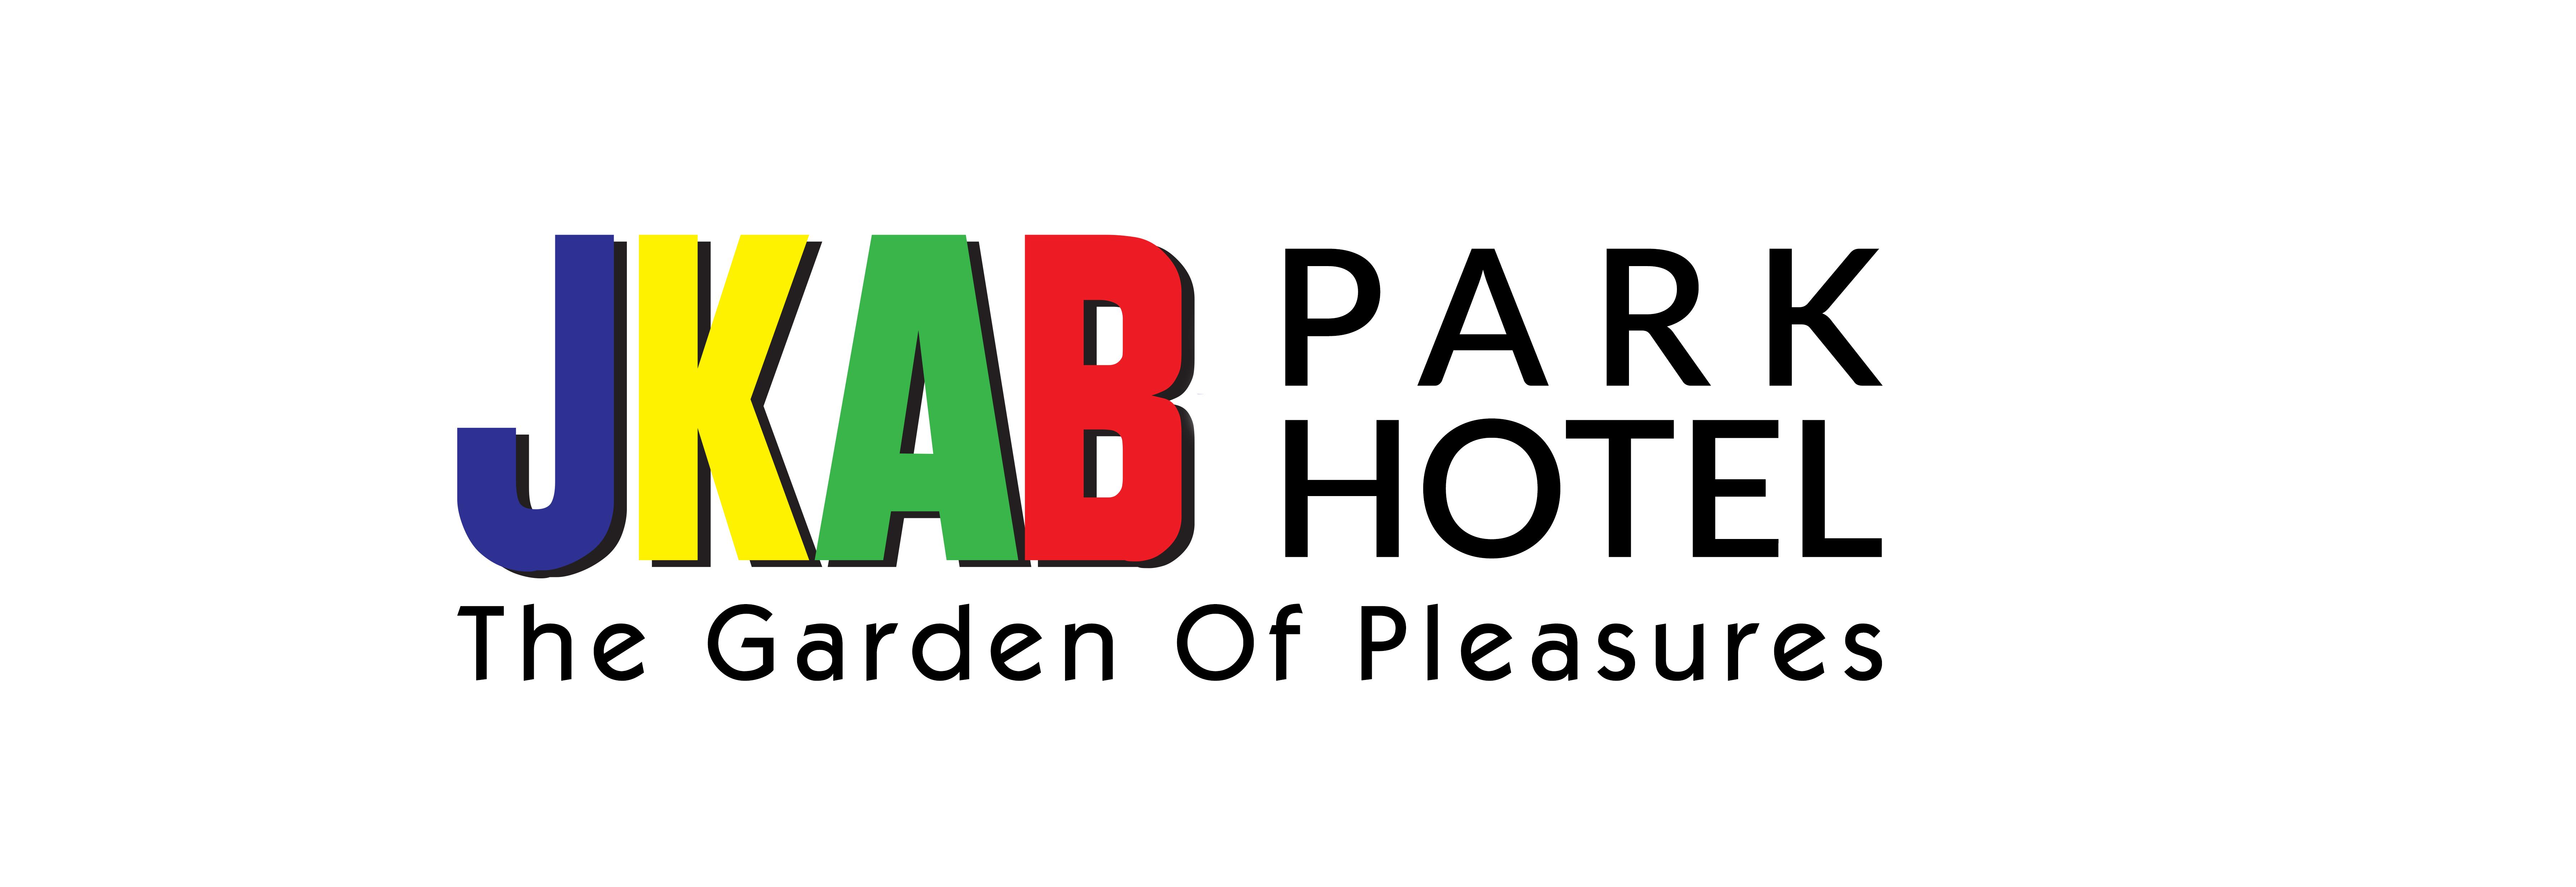 Hospitality service (Accommodation & food & beverage)